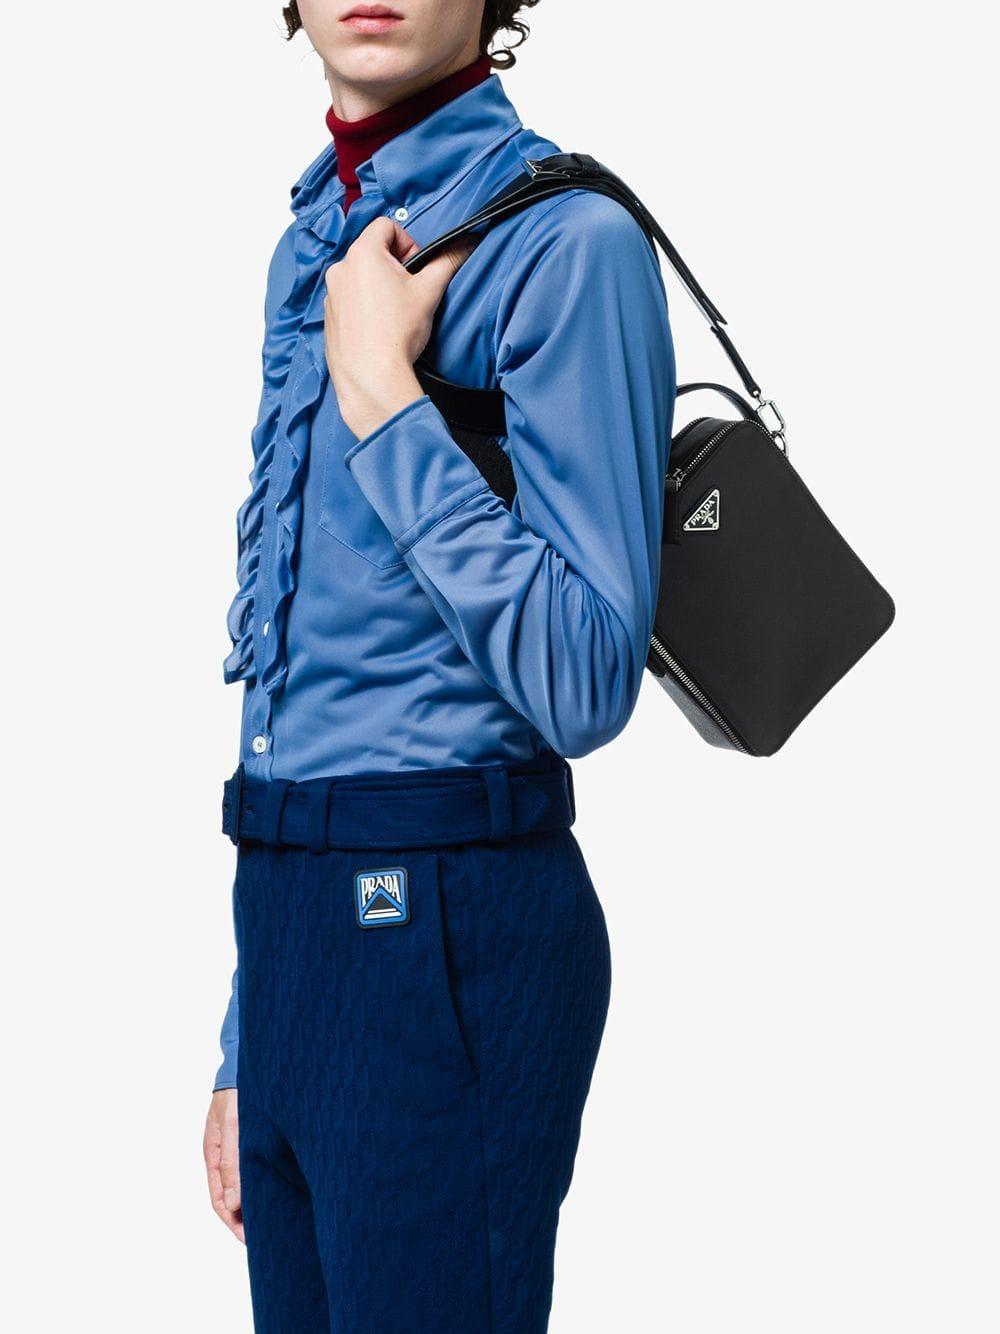 e95bd57f03b9 Lyst - Prada Saffiano Leather Shoulder Bag in Black for Men